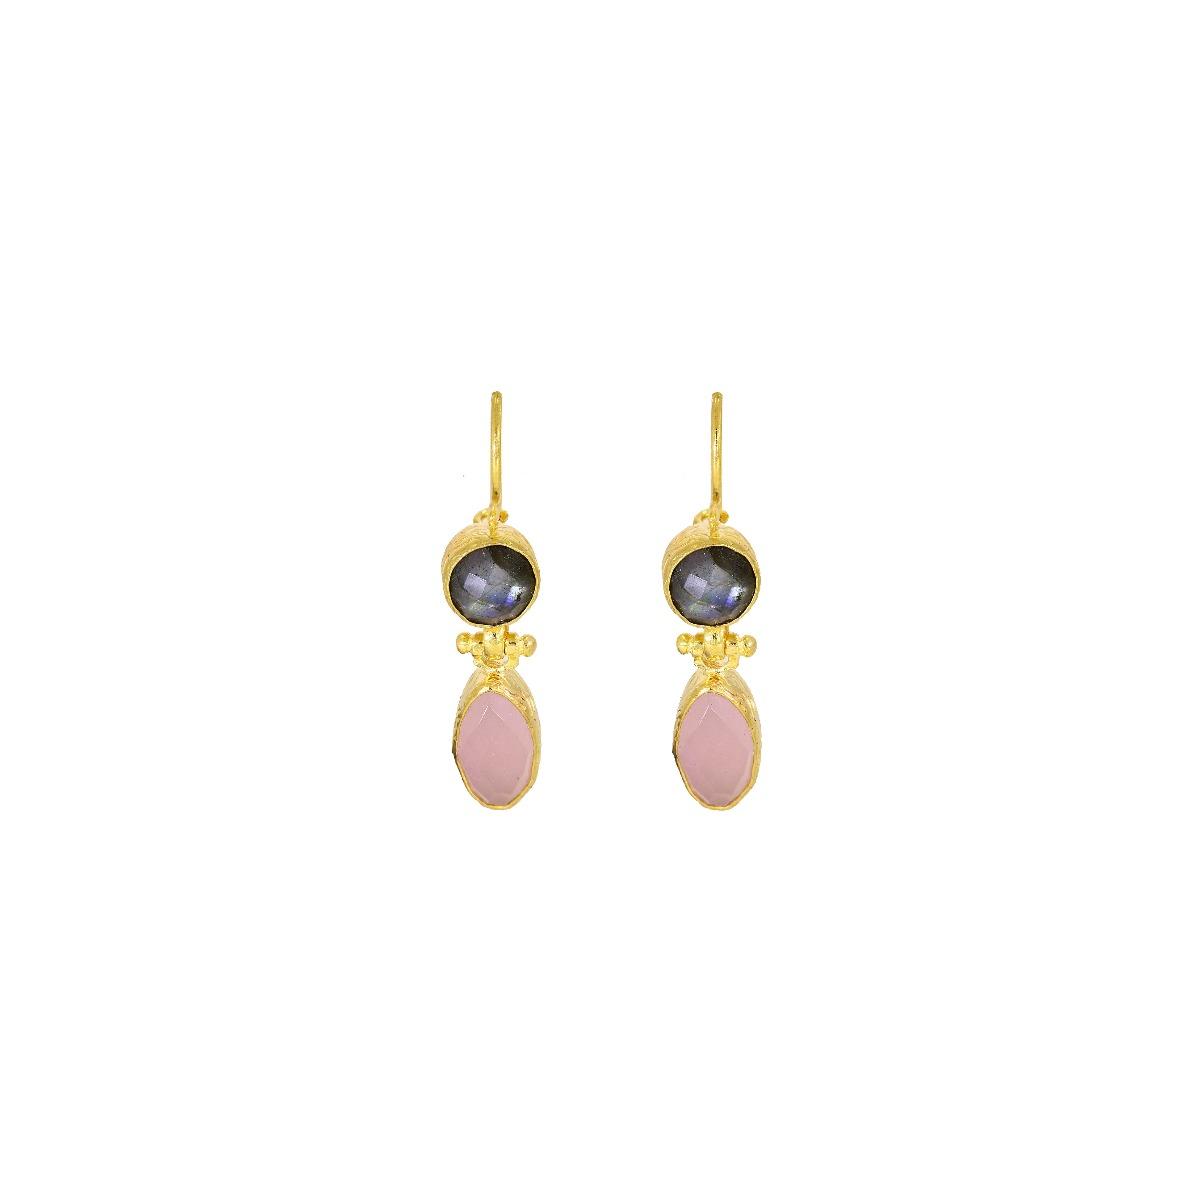 Labradorite and rose quartz drop earrings